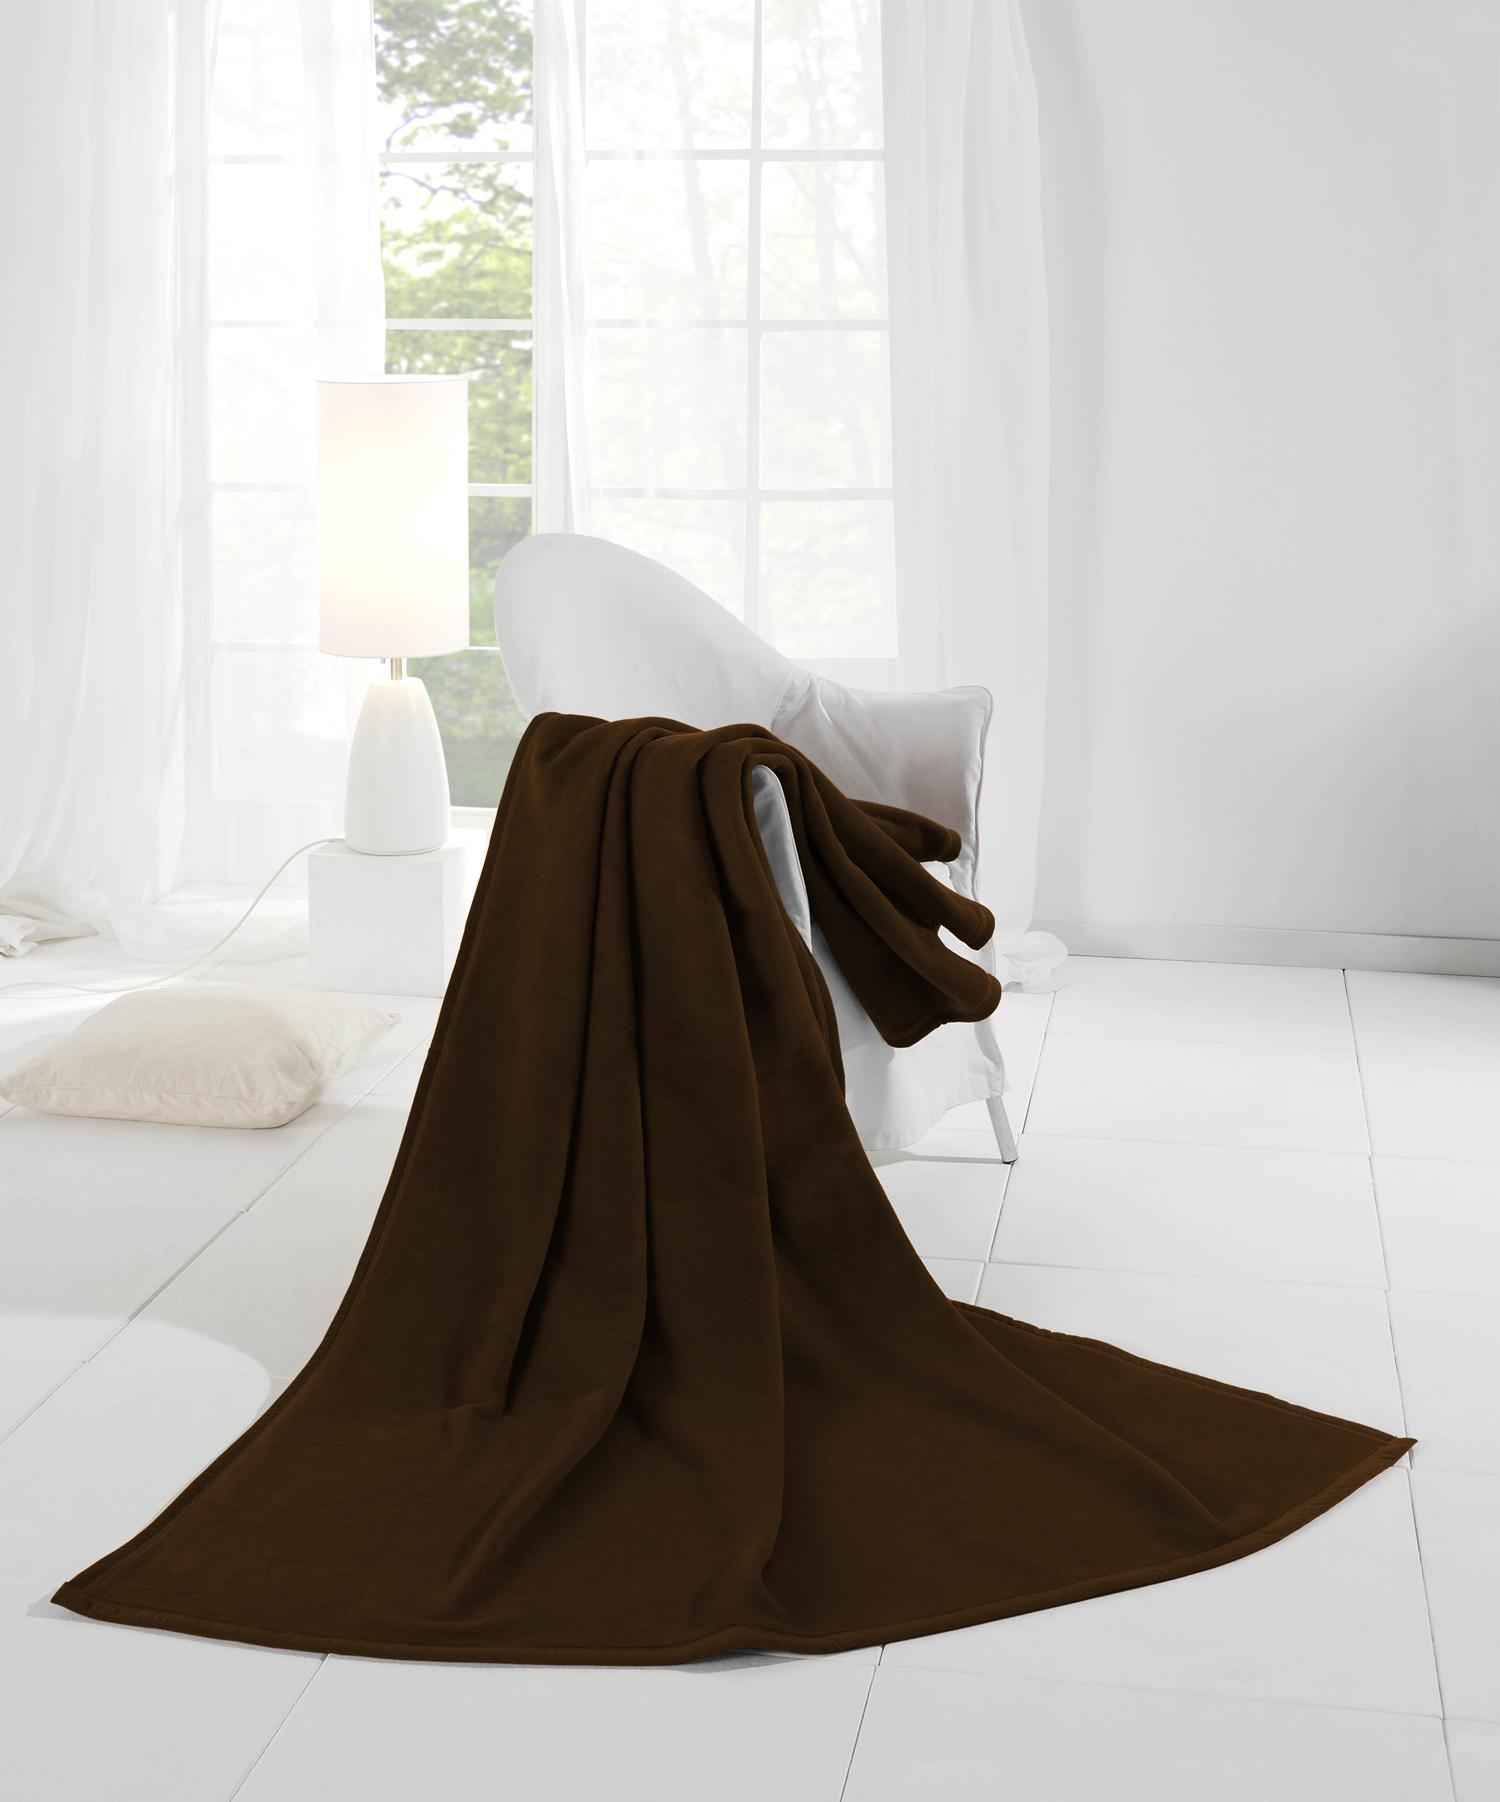 Fango Decken Orion Cotton 220 x 240 cm